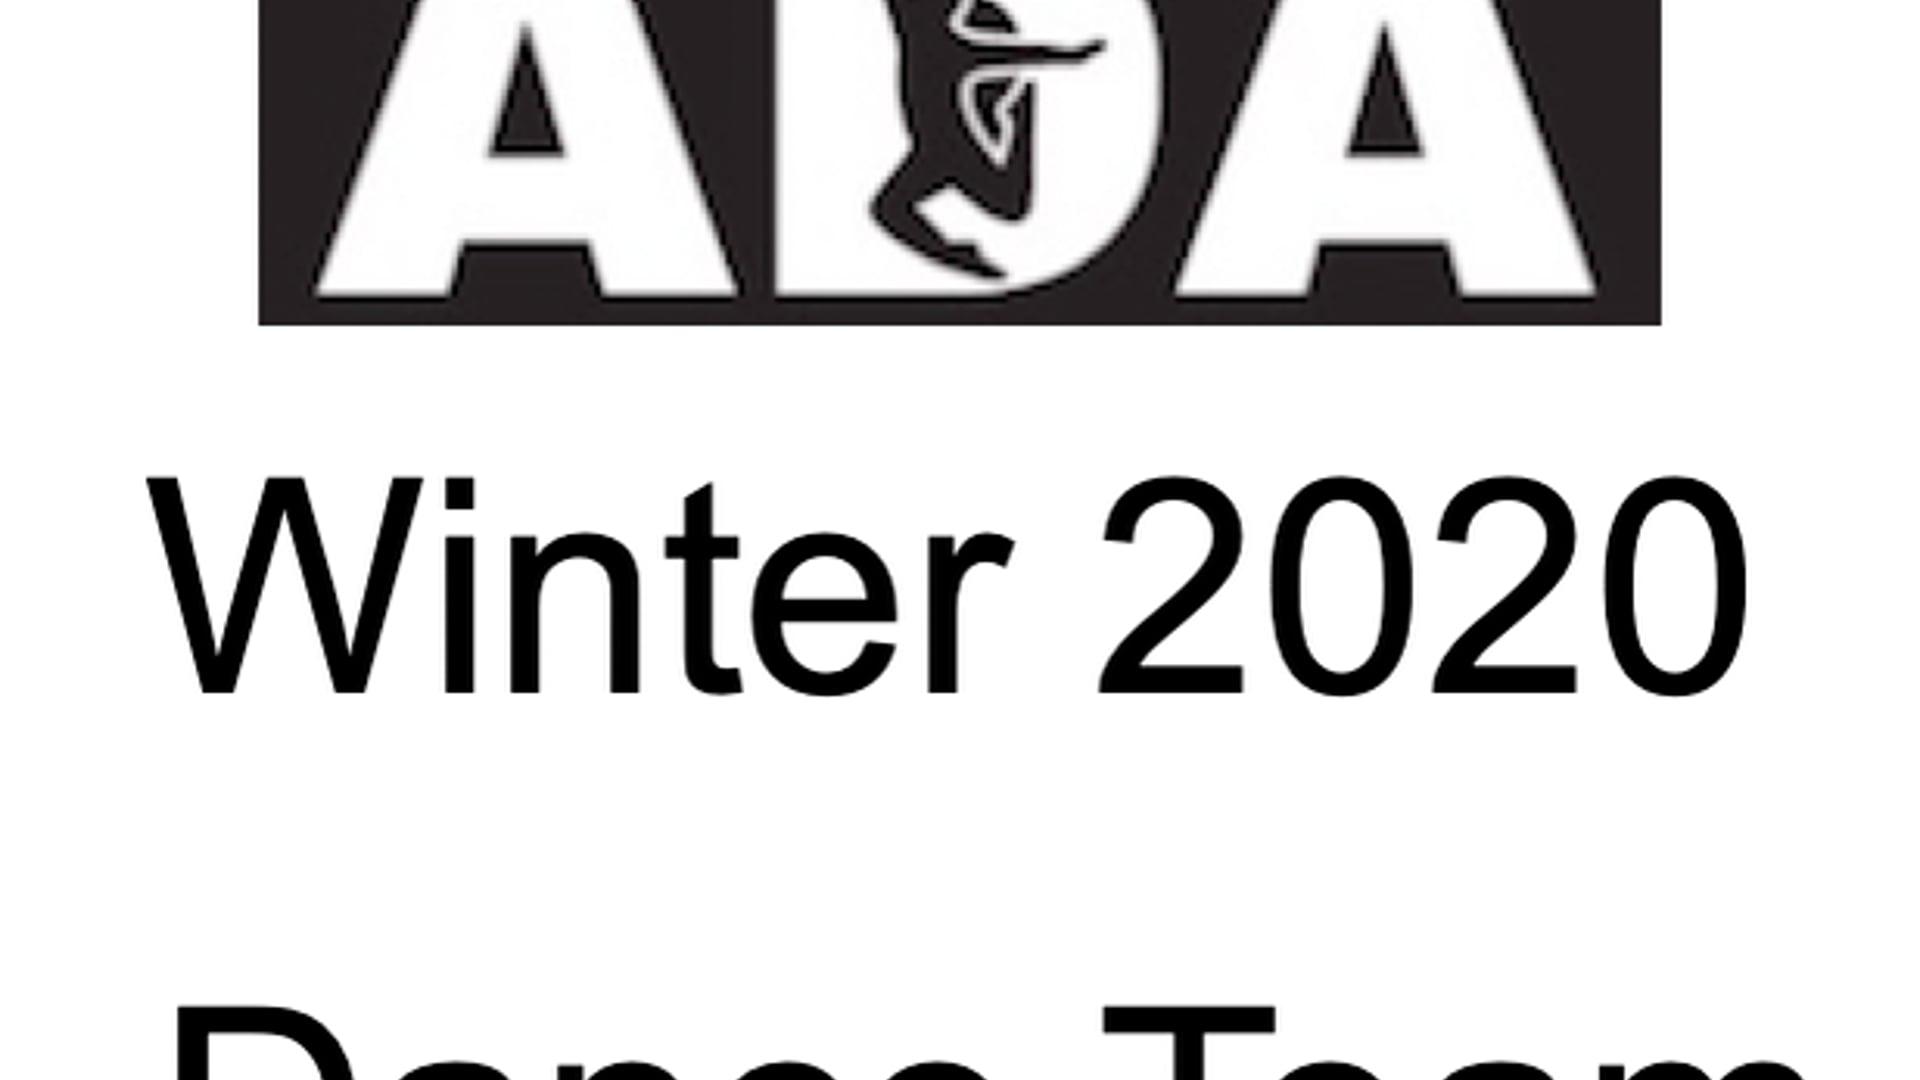 Winter 2020 Dance Team